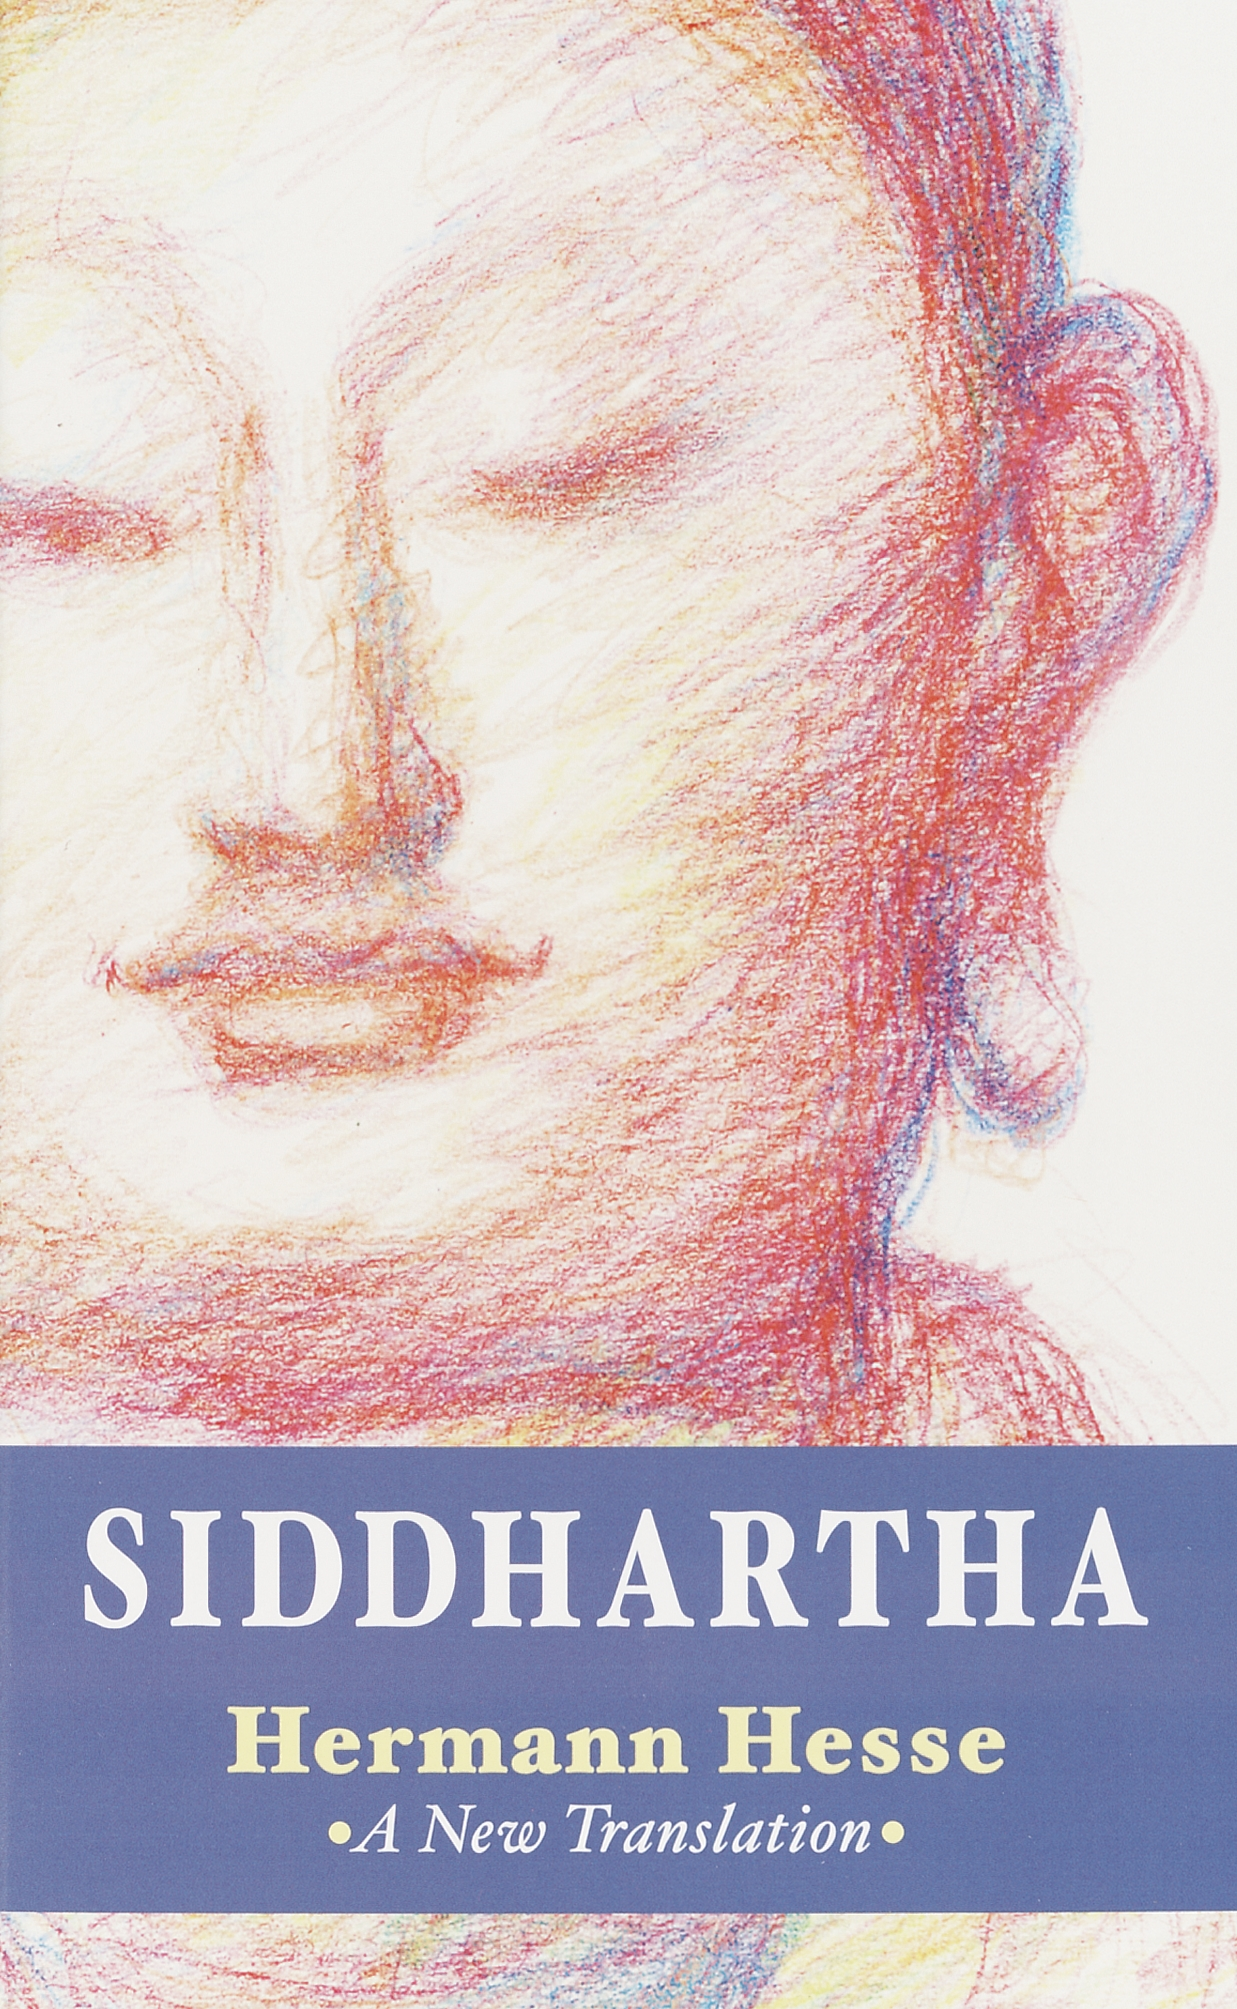 the teachers in the book siddhartha by herman hesse Siddhartha by herman hesse is a spiritual novel that follows siddhartha as he seeks  unlike the other teachers that siddhartha comes across in the book,.